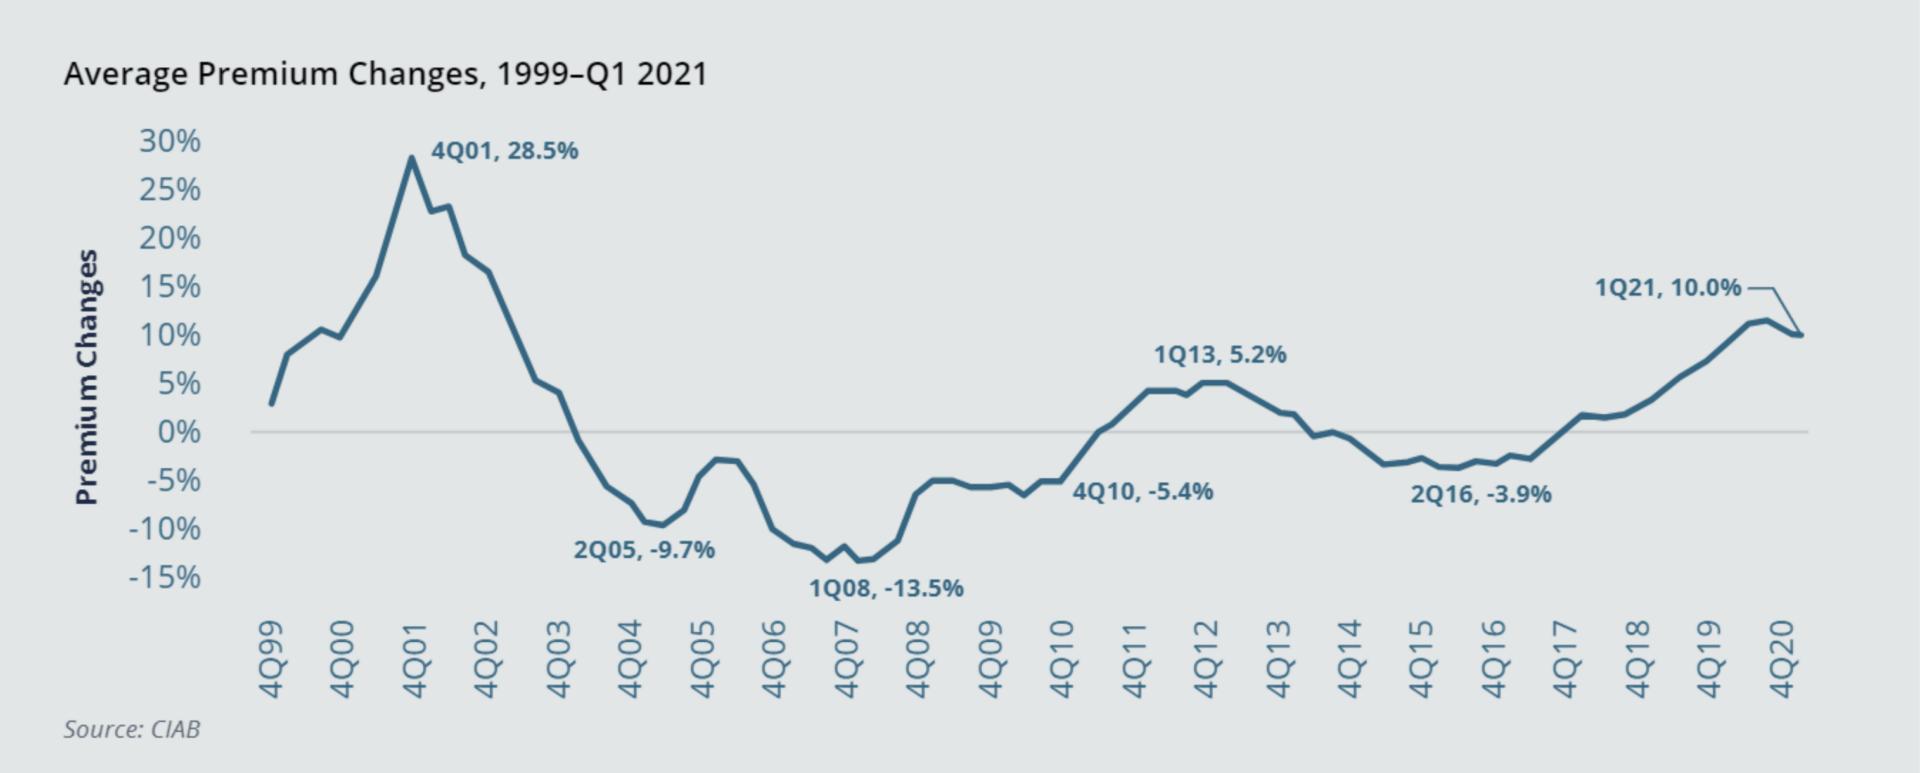 2021 construction industry premium increases